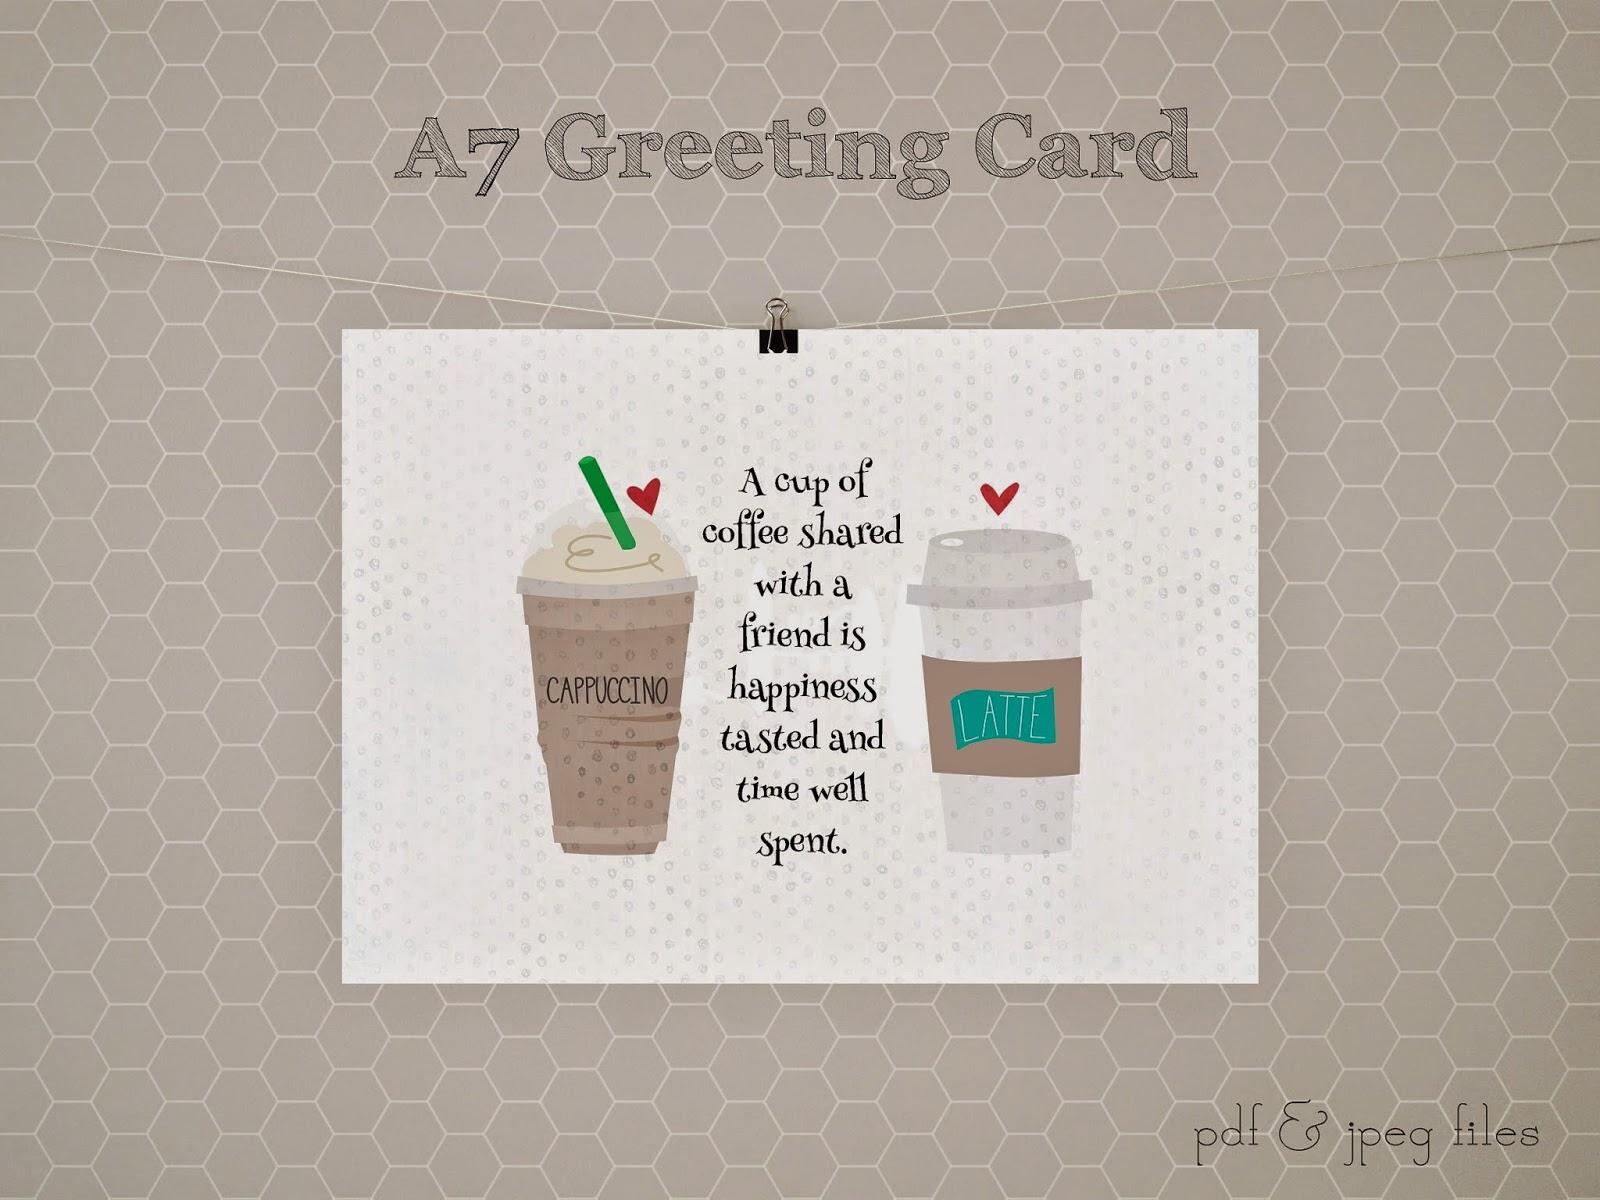 https://1.bp.blogspot.com/-4nNxoC9kqO4/VFF0InDlmMI/AAAAAAAAIzs/nJbdvnUJAQ0/s1600/Coffee%2BShared%2B5x7%2BCard%2BMock%2BUp.jpg